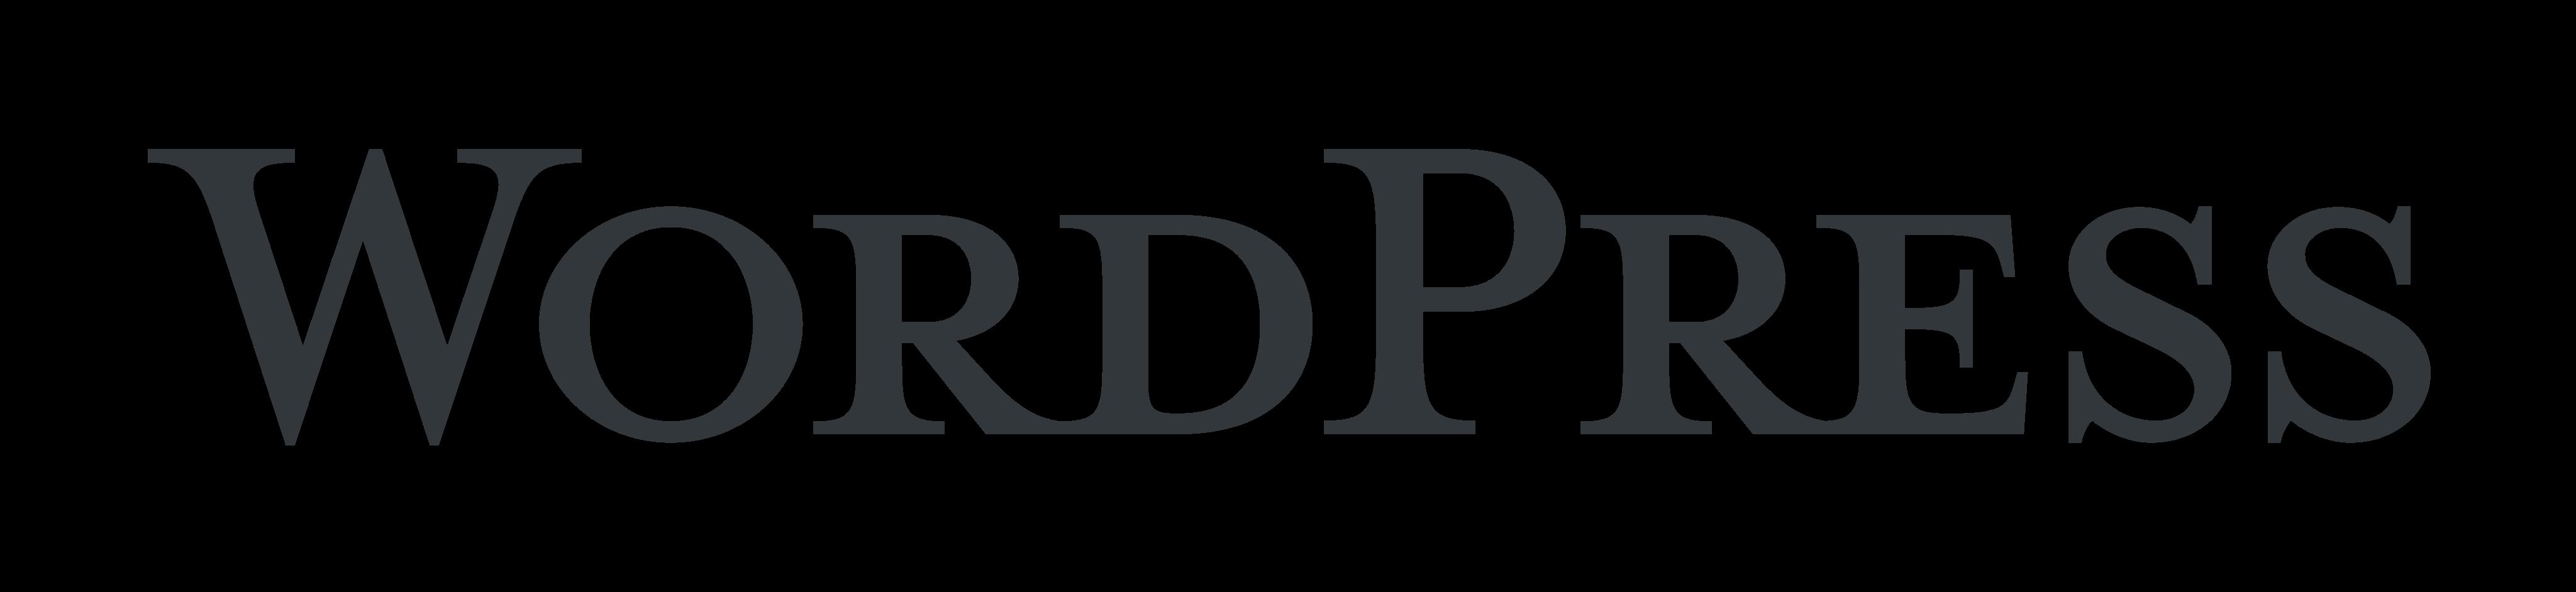 wordpress-logo-2-1